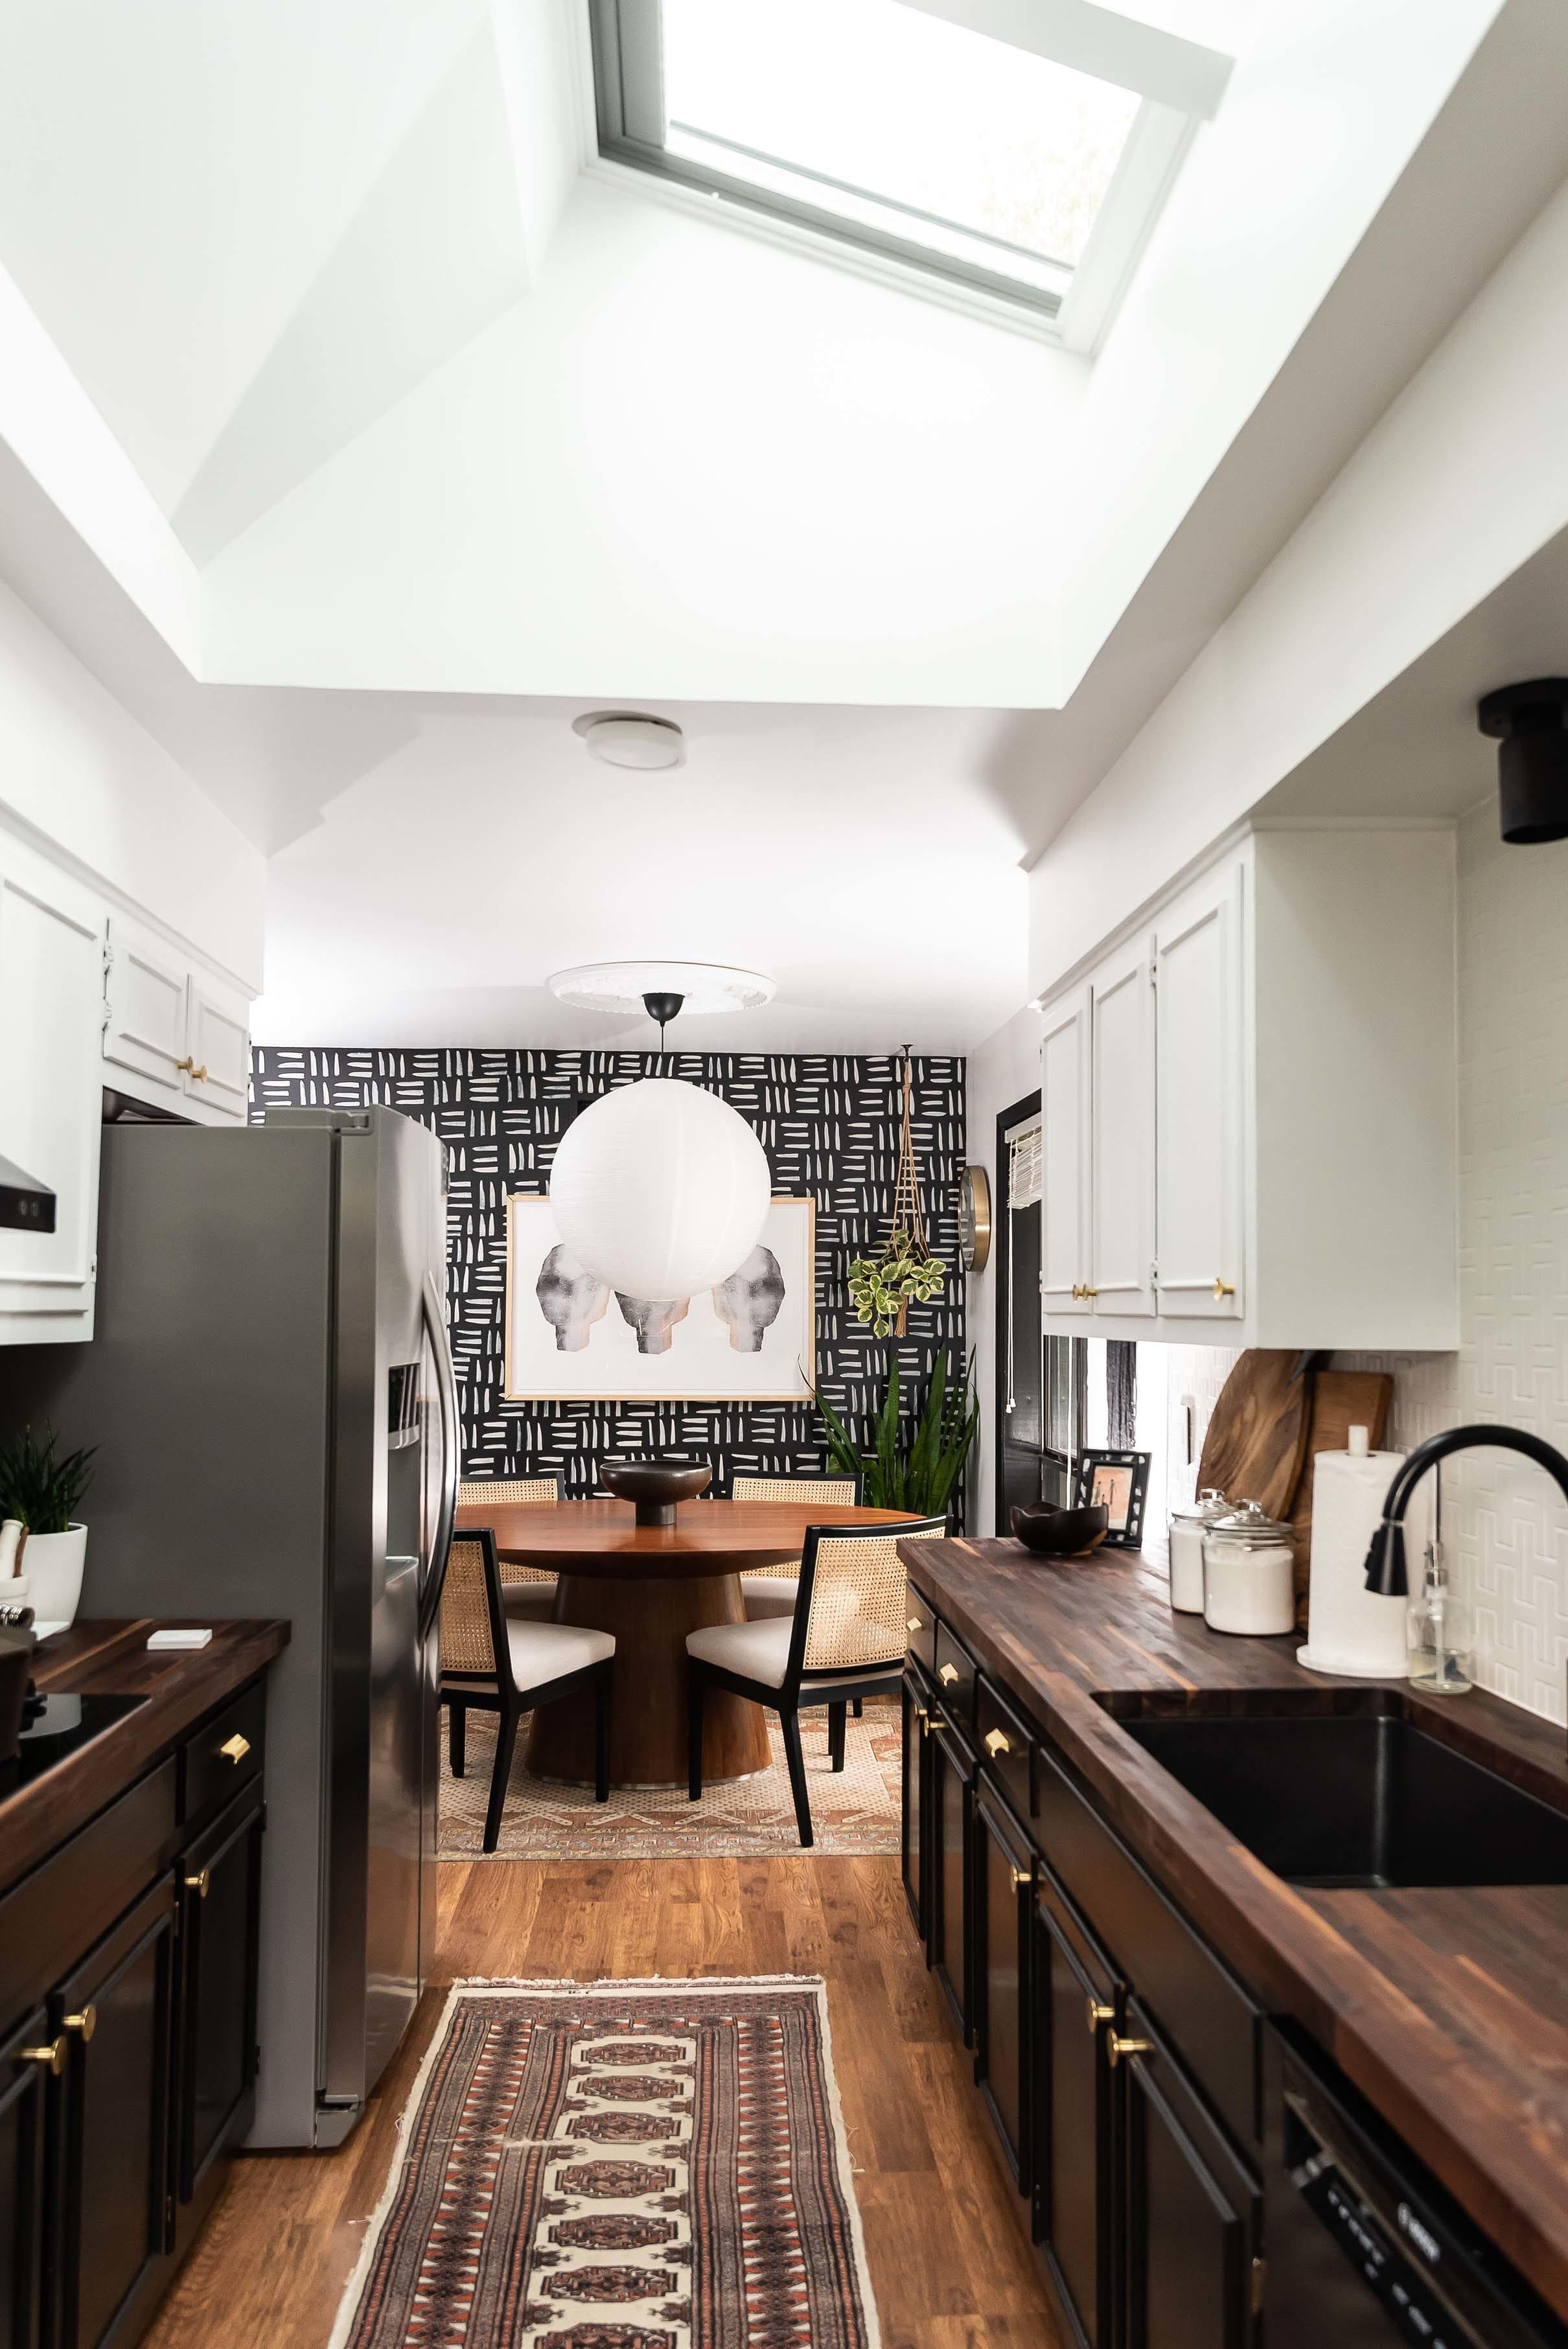 Ktichen black cabinets skylights butcher block counters